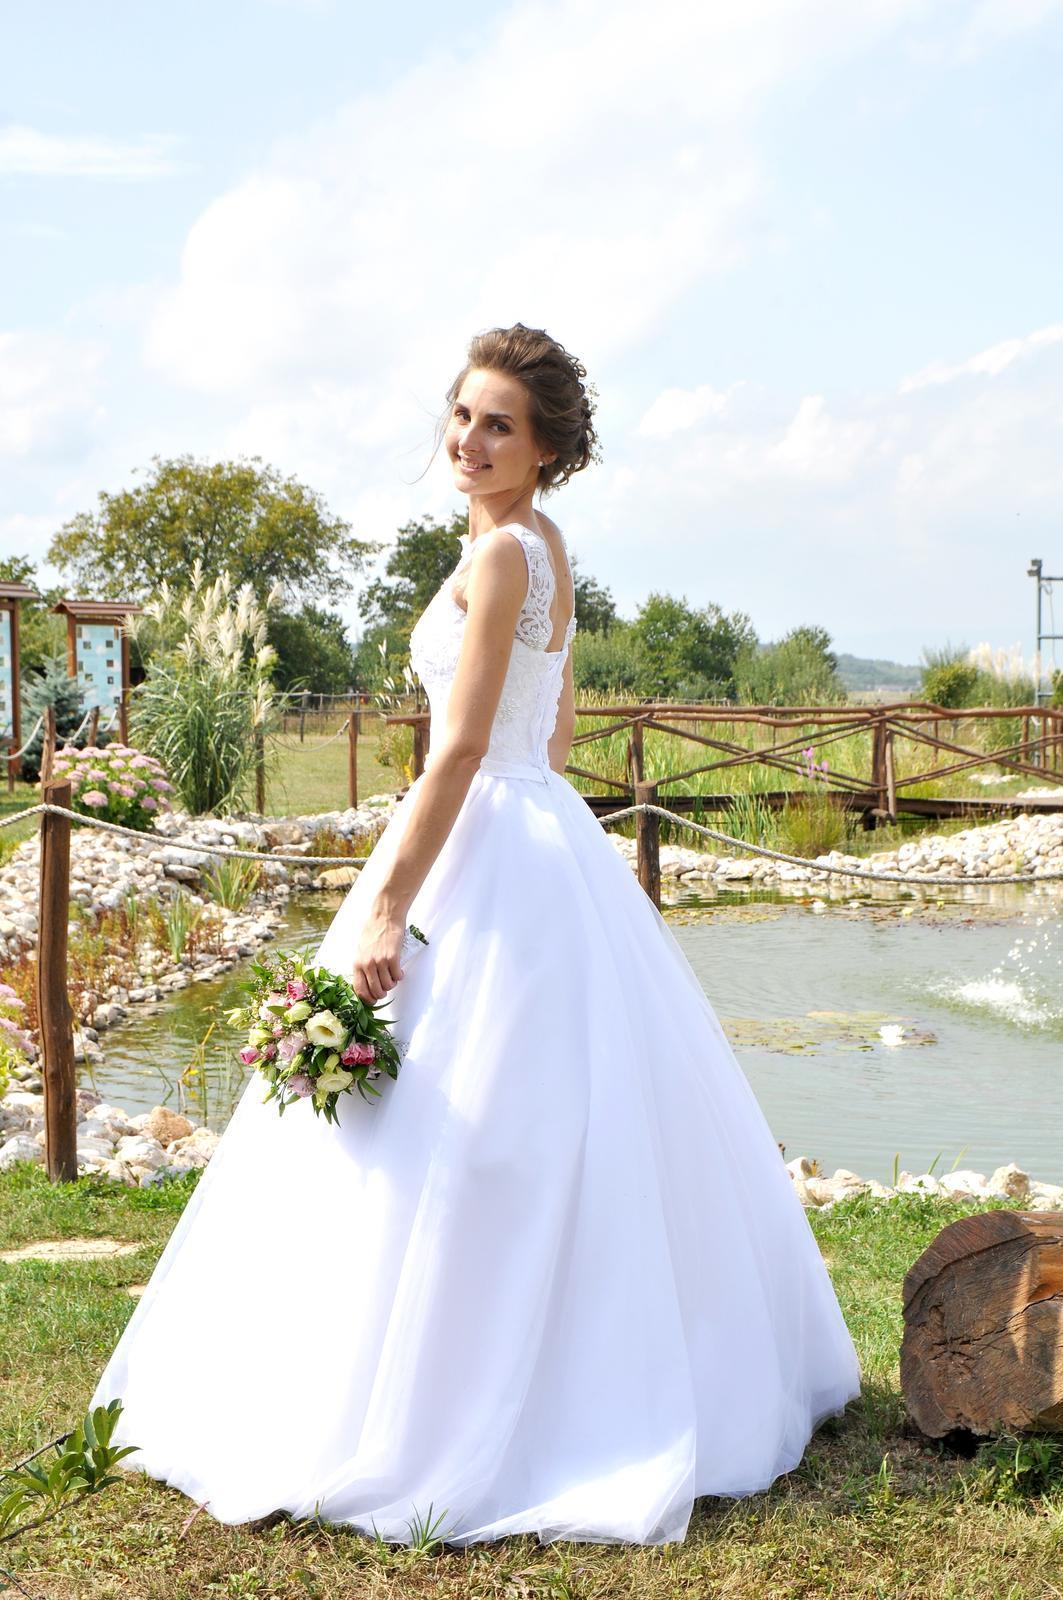 Svadobné šaty - vel.32 - Obrázok č. 1